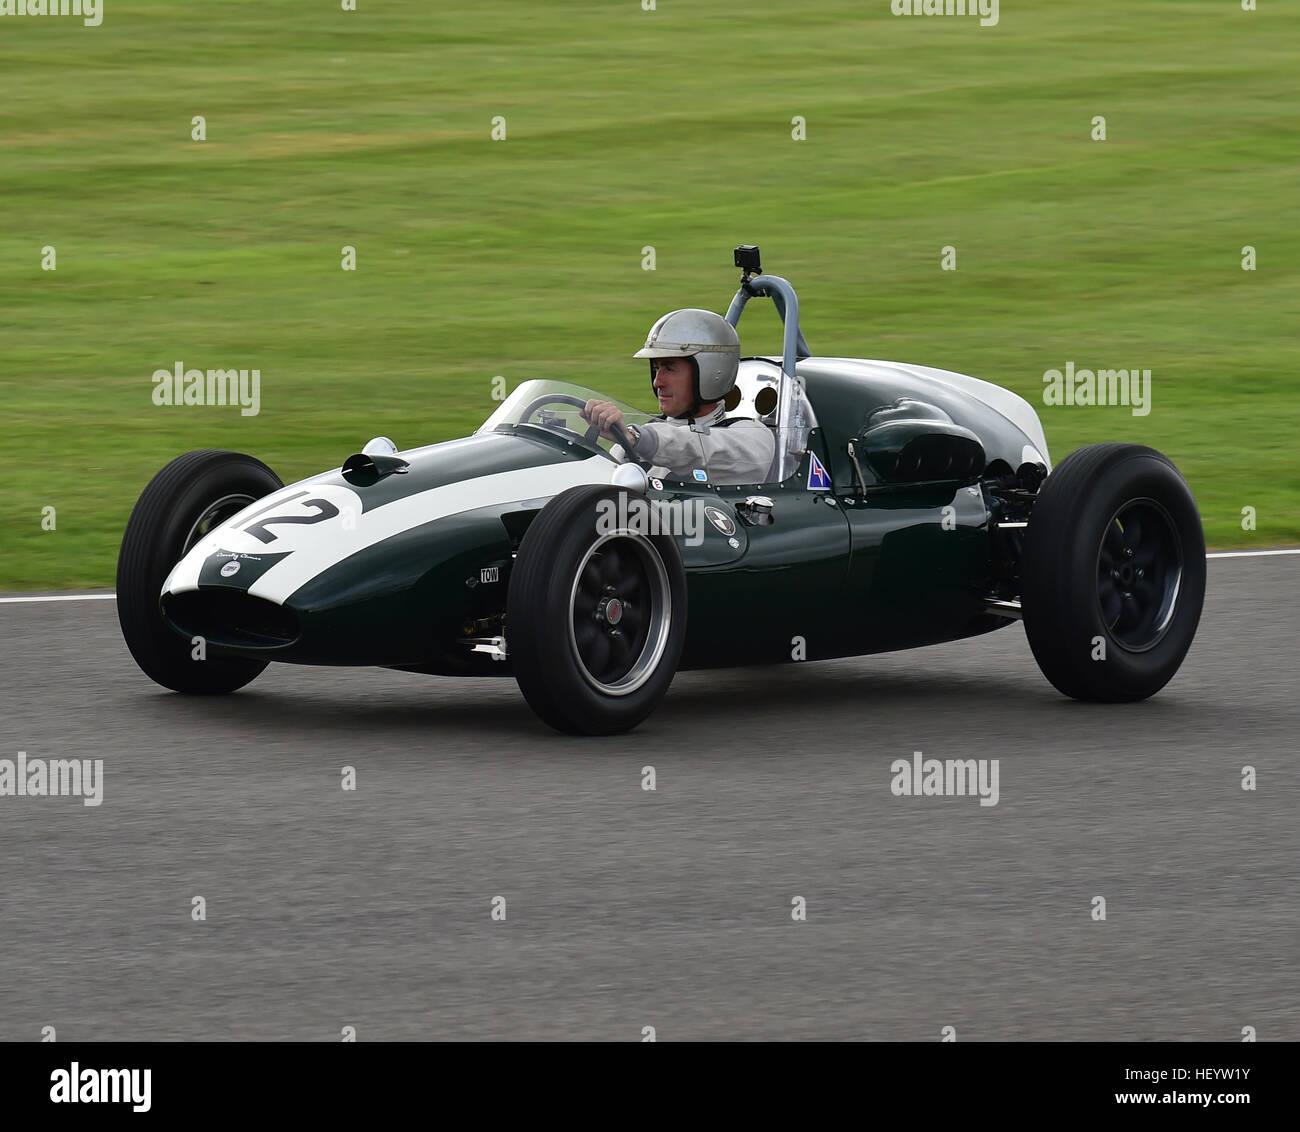 David Brabham Cooper Climax Jack Brabham Tribute Goodwood